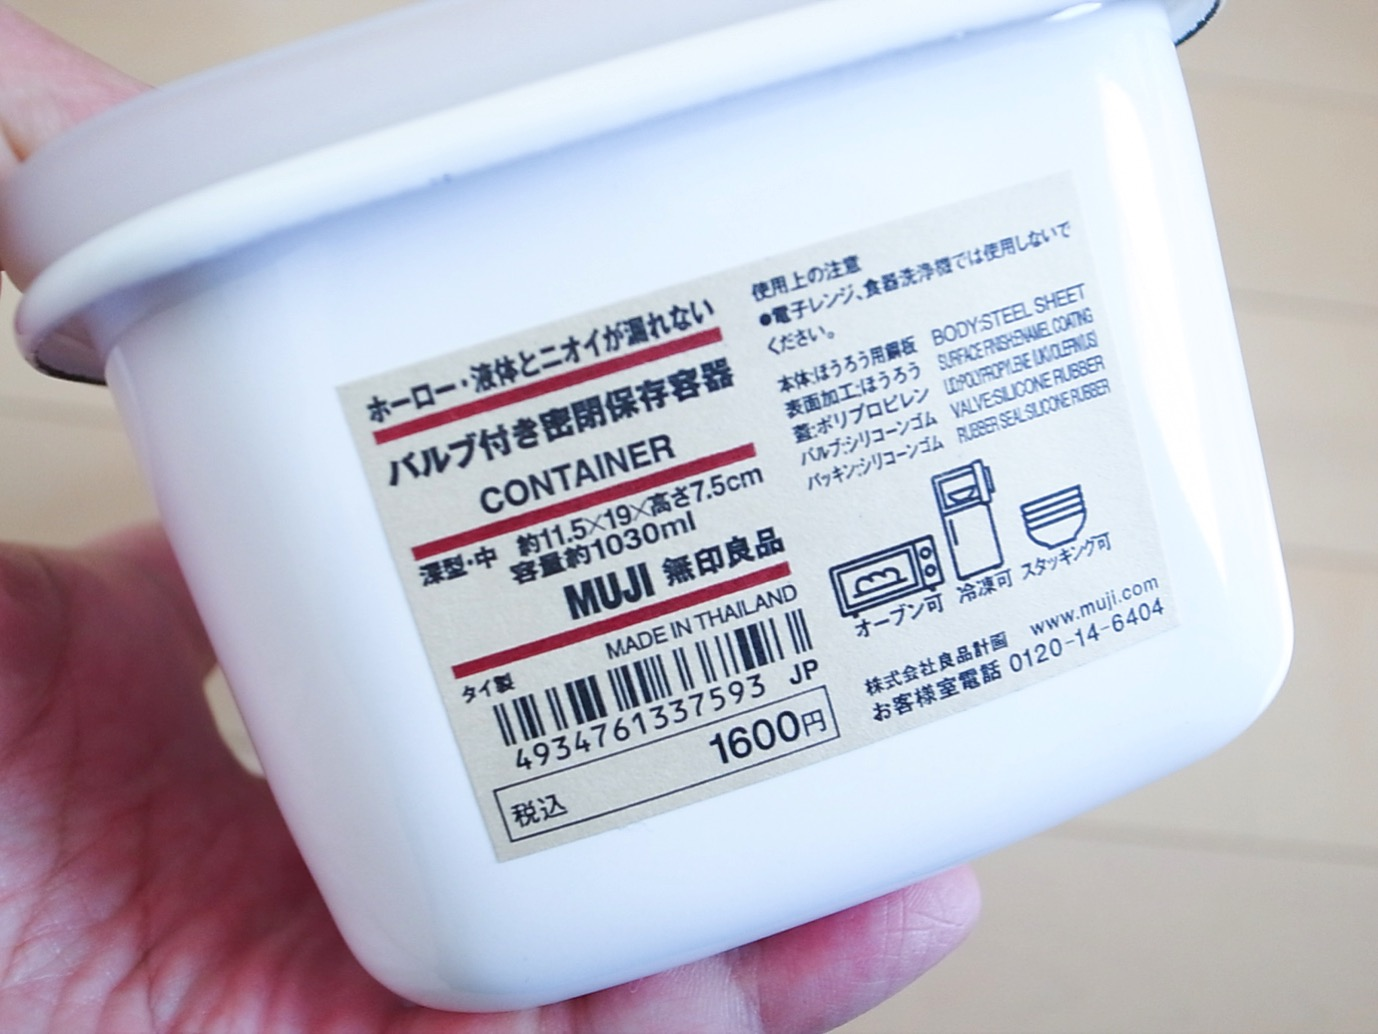 Container fuka m 2